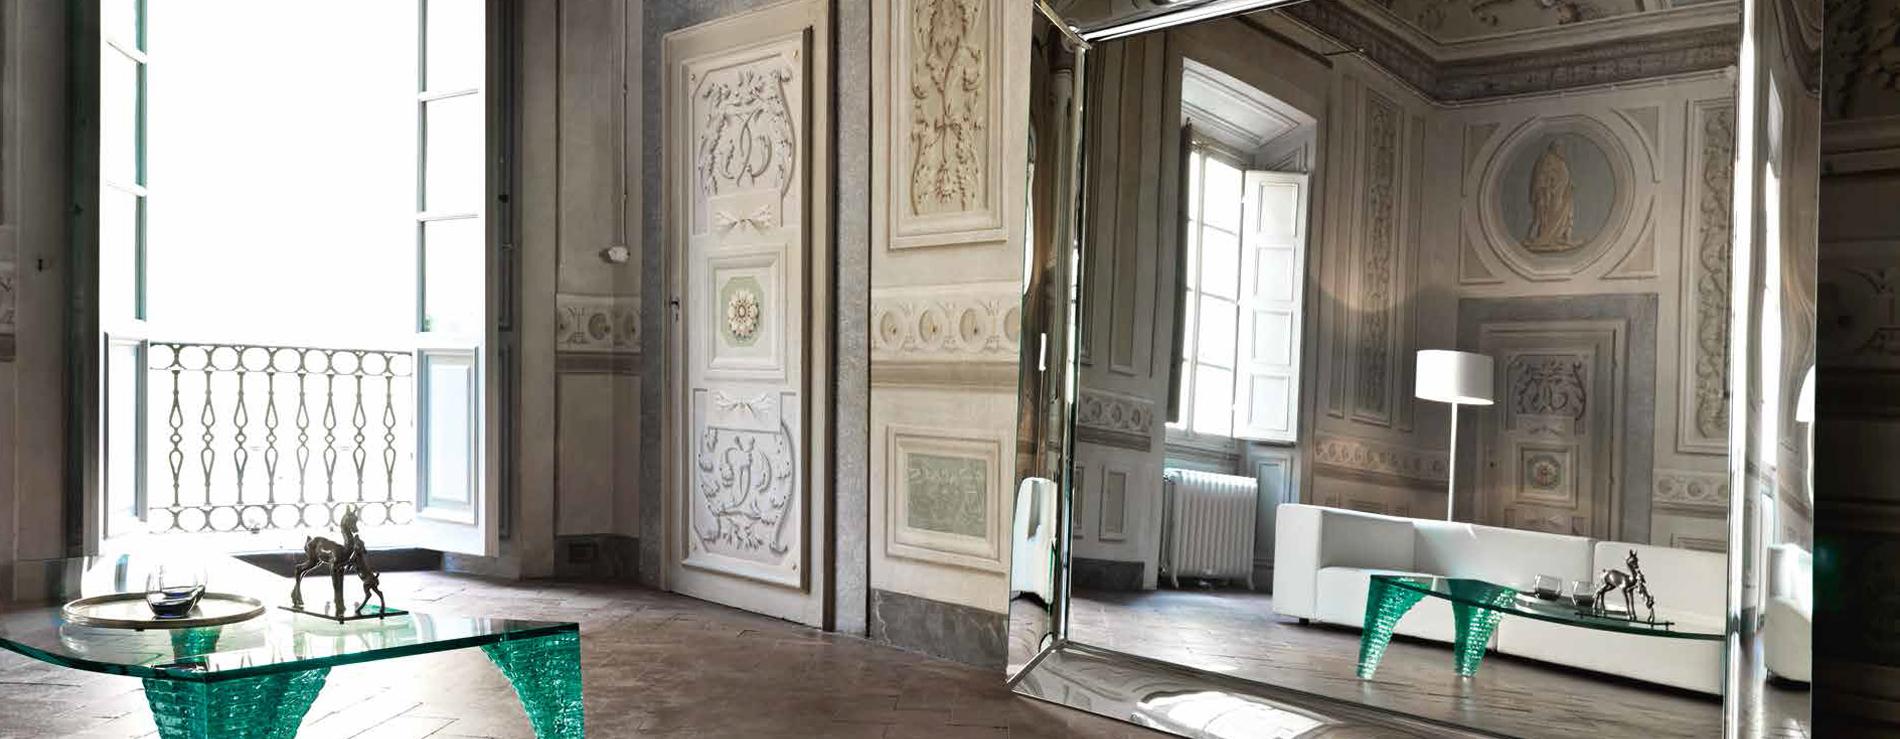 specchio-caadre